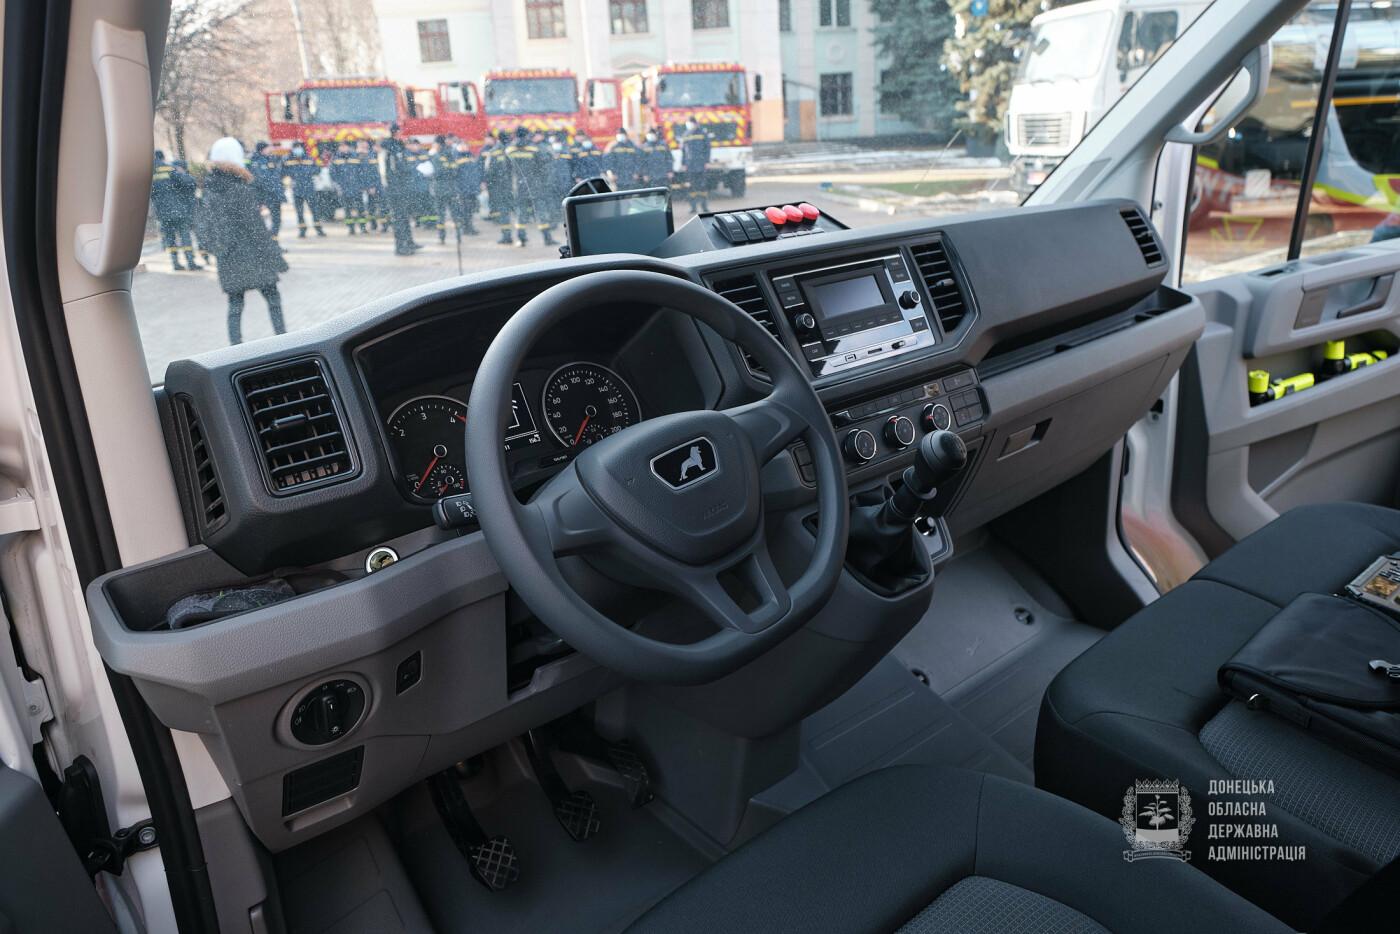 Слов'янські рятувальники отримали нову пожежну автоцистерну, фото-9